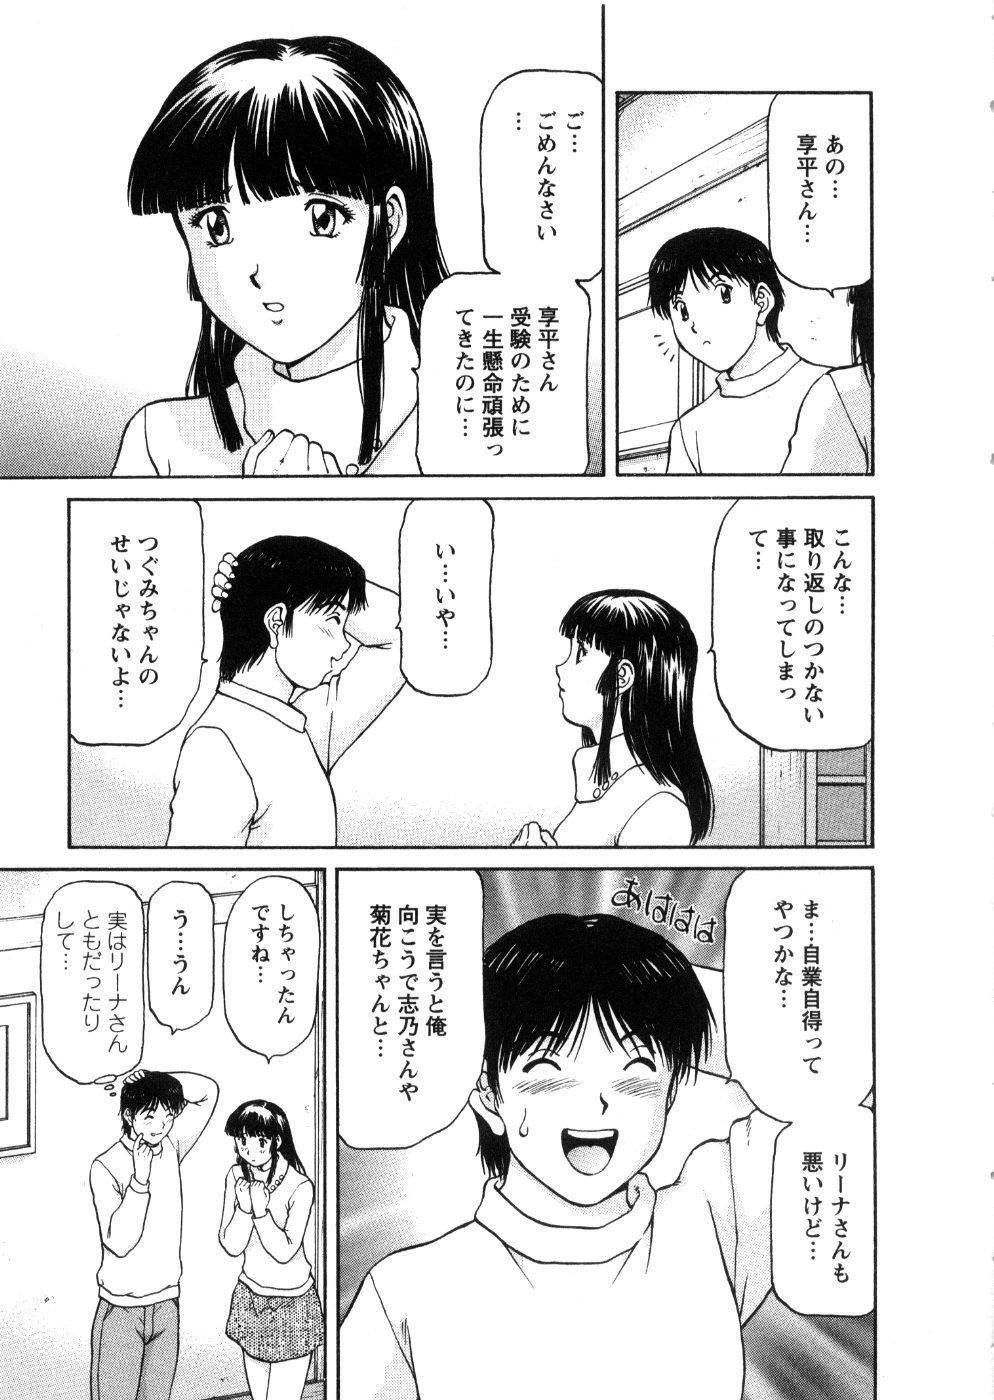 Oneechan-tachi ga Yatte Kuru 03 58